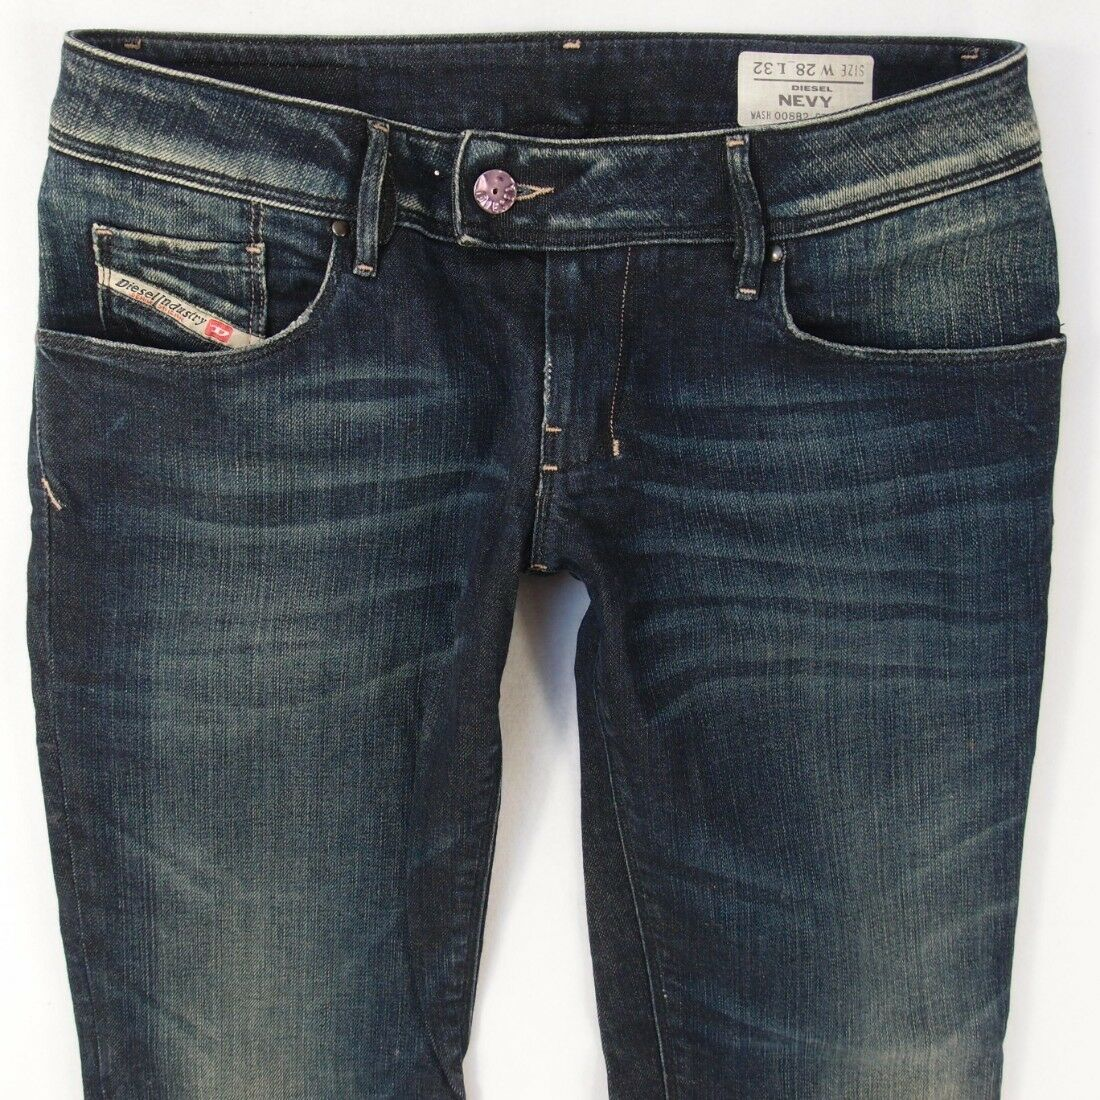 Ladies Womens Diesel NEVY 008B2 Stretch Slim bluee Jeans W28 L32 UK Size 8